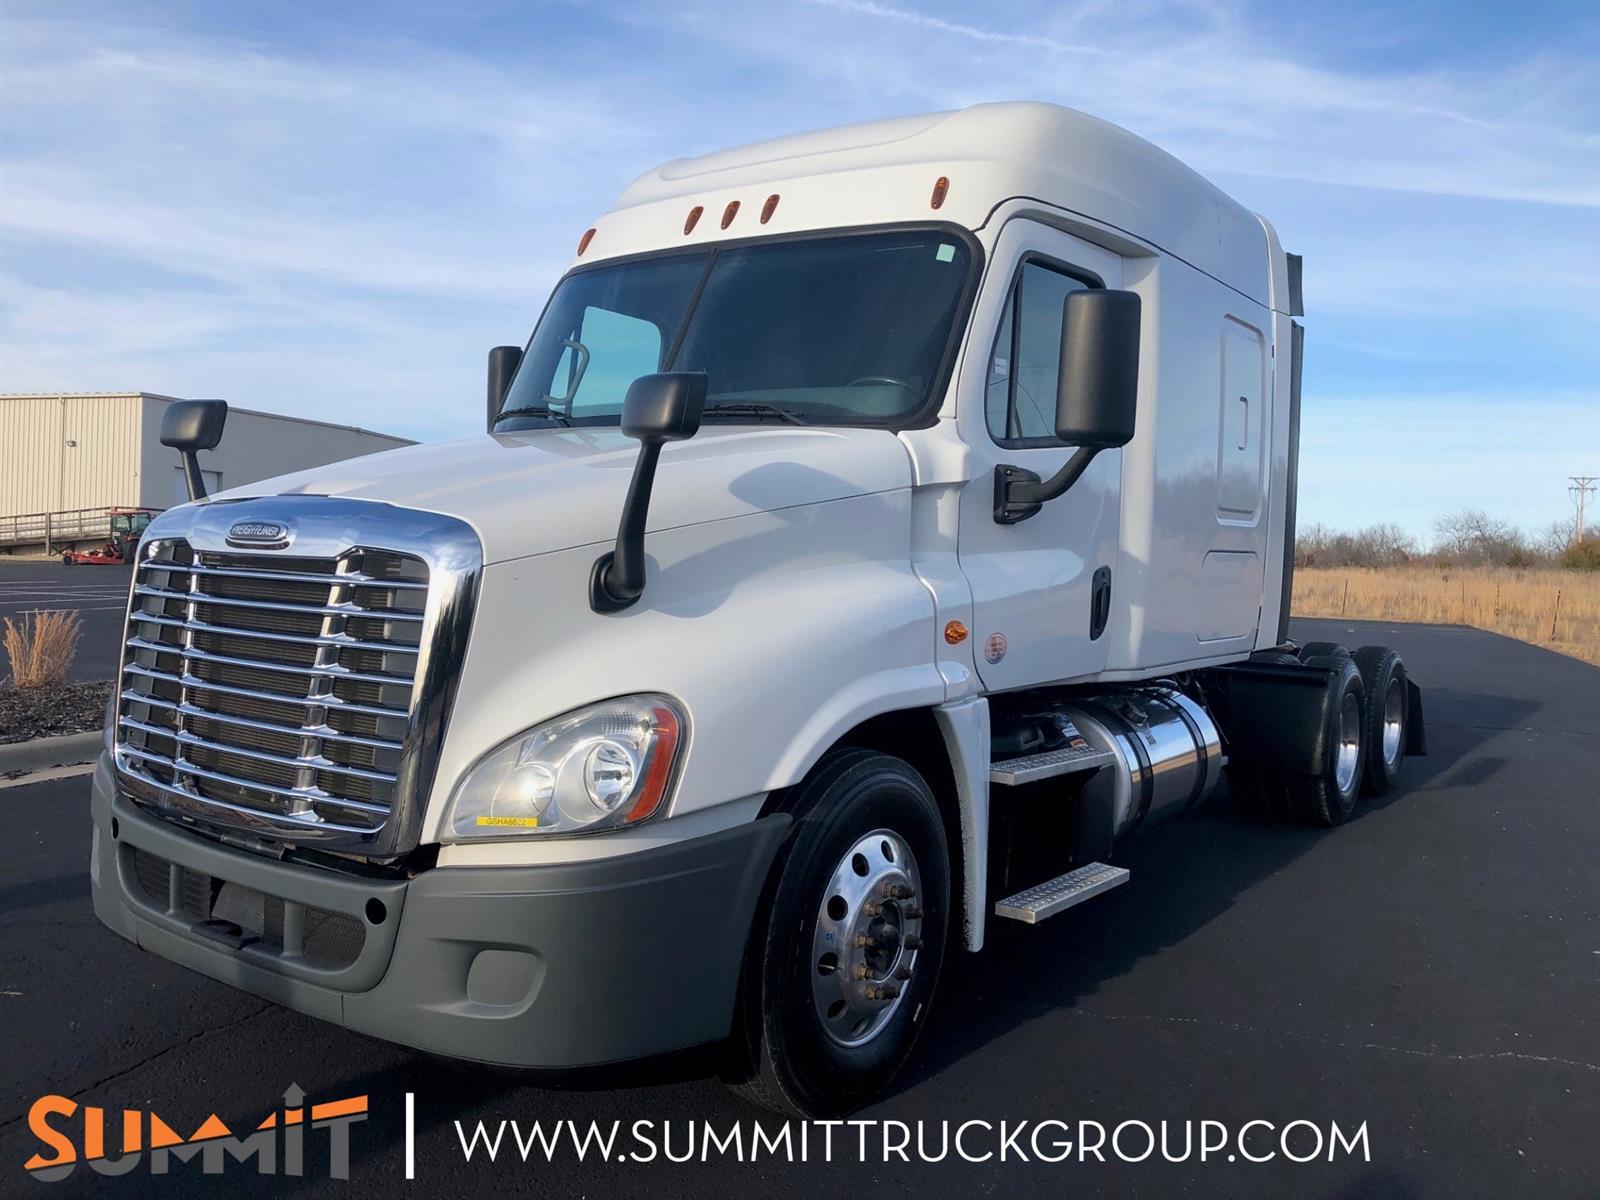 2016 Freightliner Truck Sleeper Cab 6x4, Tractor #150P202430 - photo 1